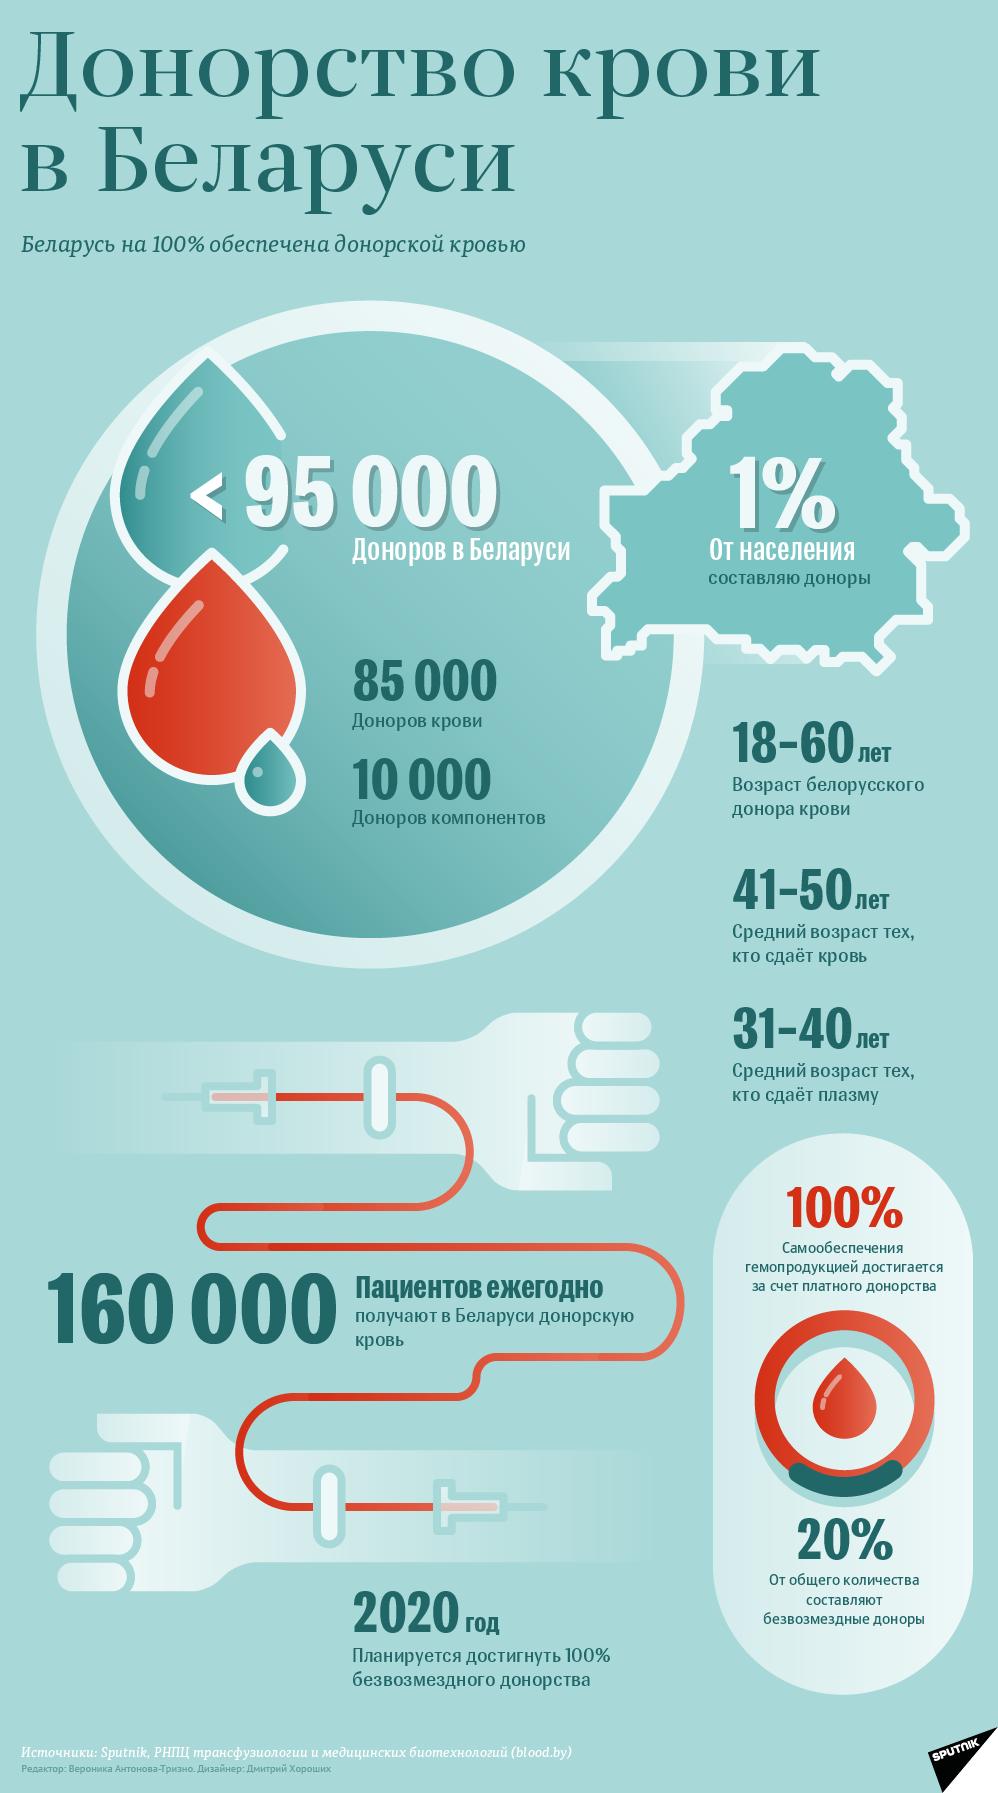 Донорство крови в Беларуси – инфографика sputnik.by